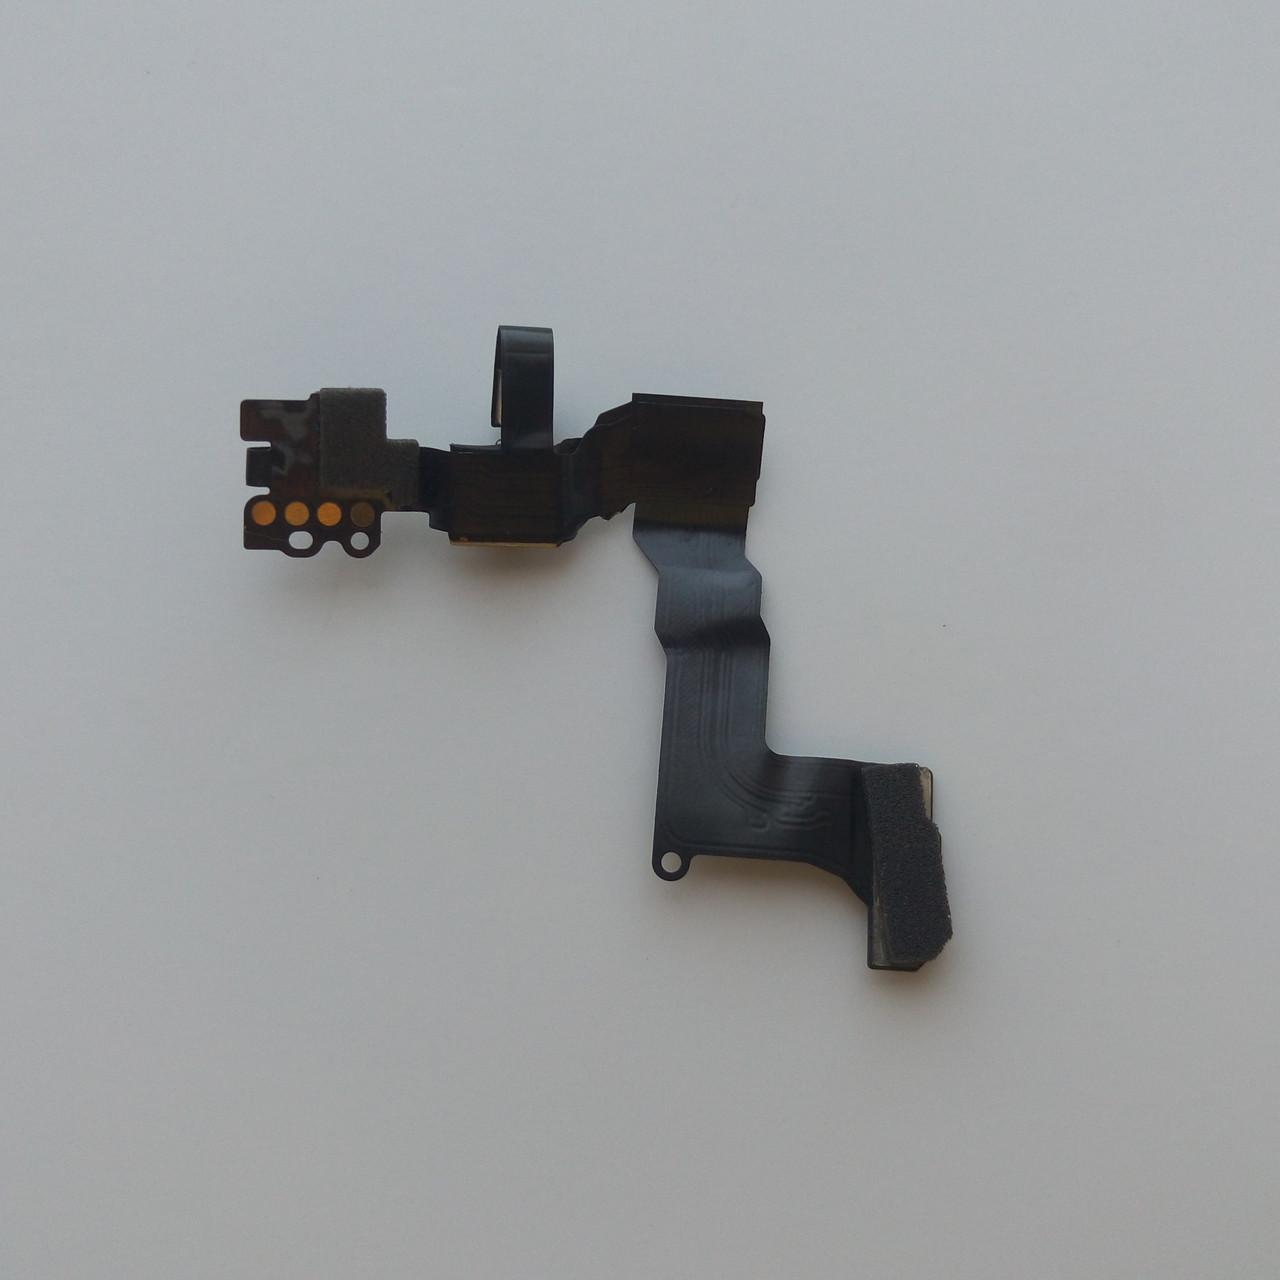 Шлейф Apple iPhone 5S, подсветки дисплея, с камерой, с компонентами, с микрофоном